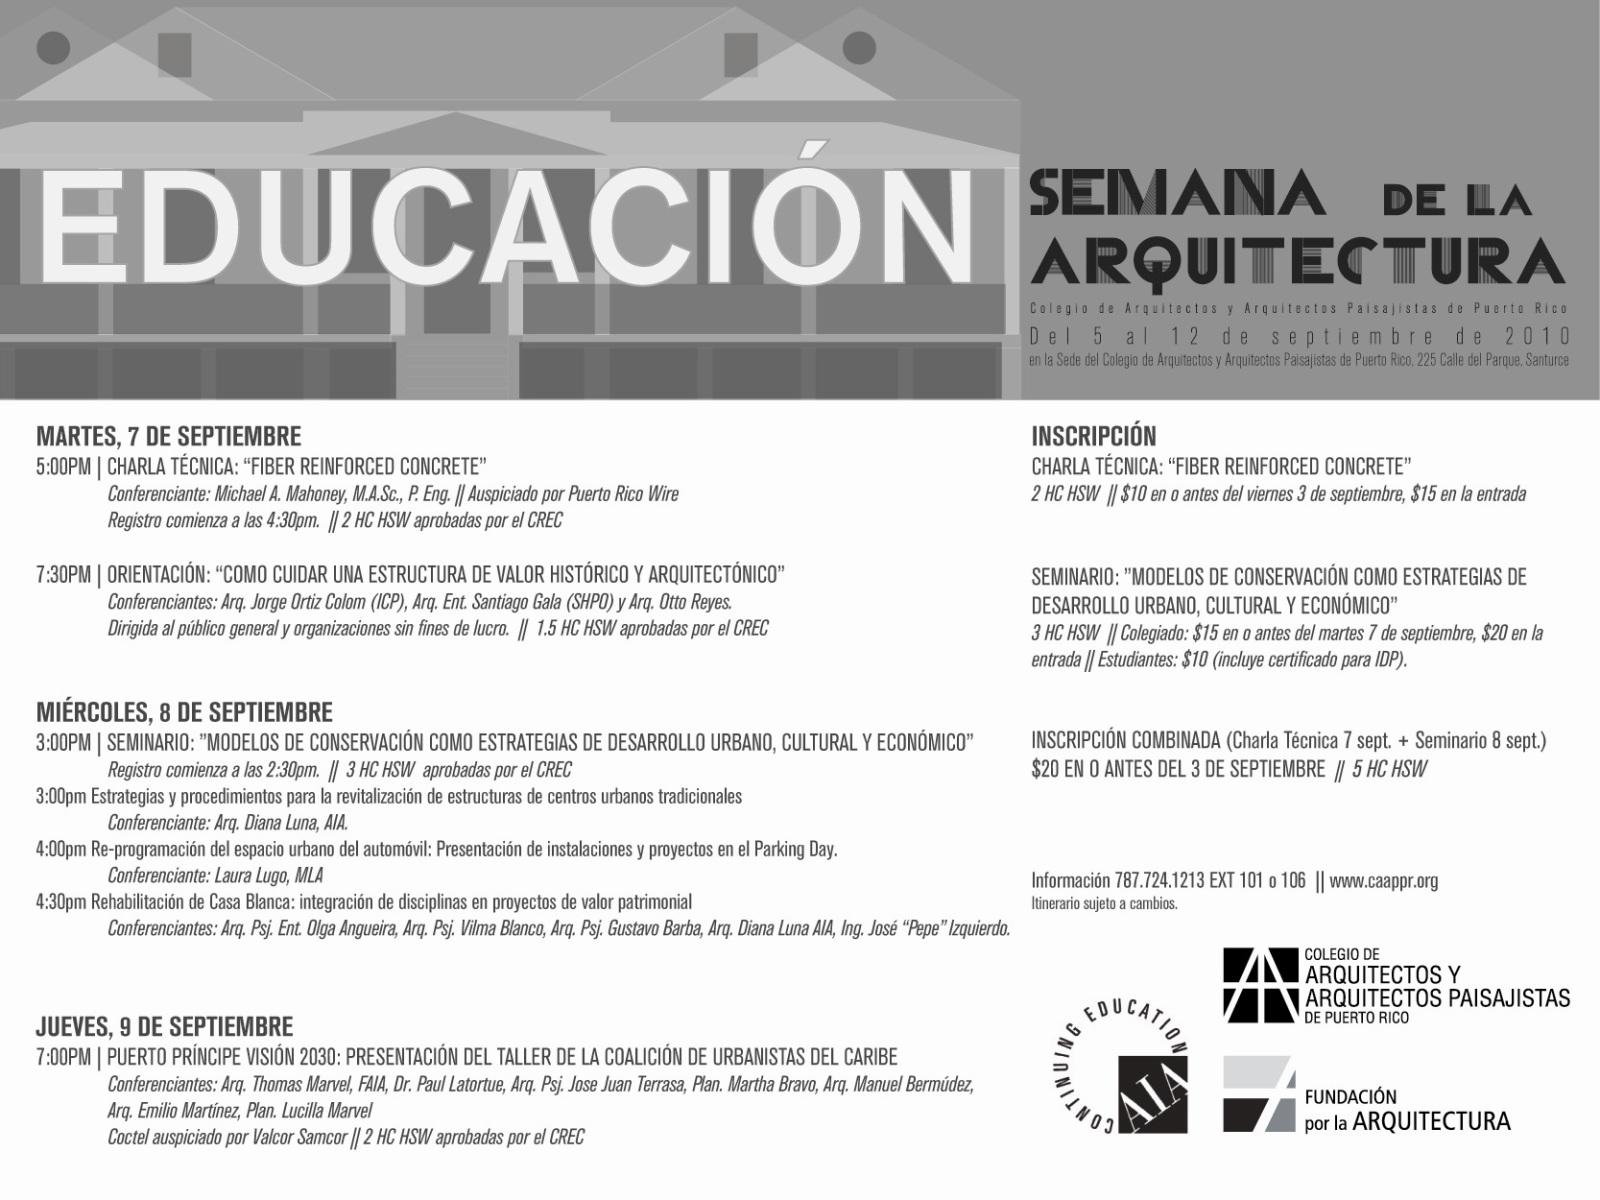 arquillano EVENTO DE LA SEMANA   Semana de la Arquitectura 2010